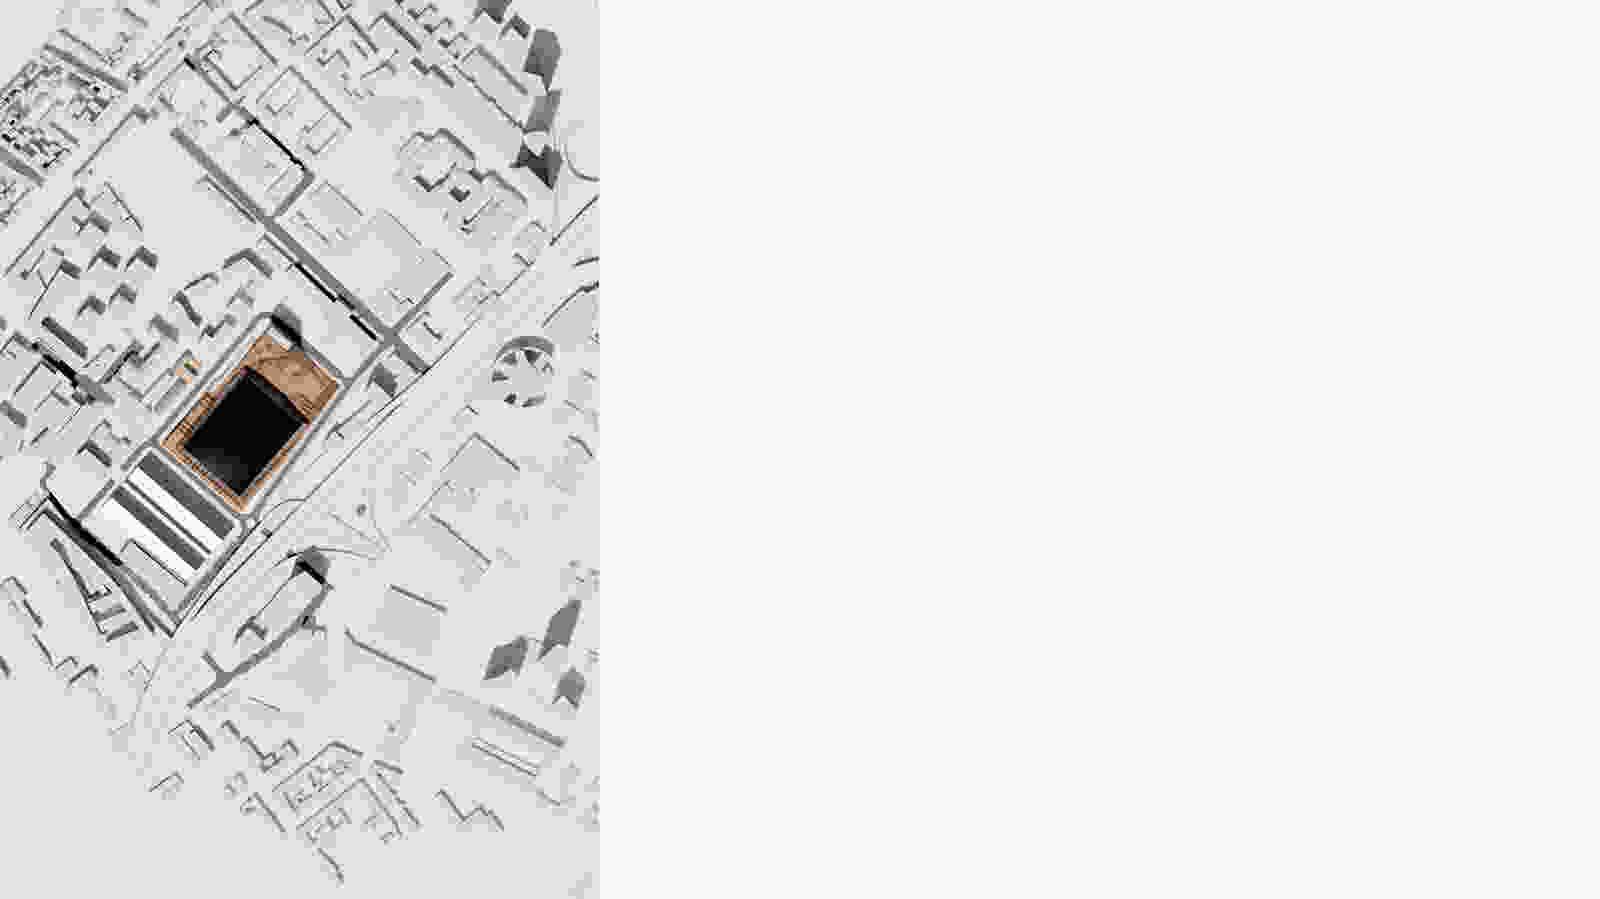 466 DMAA WH Arena Vienna vis 020b siteplan